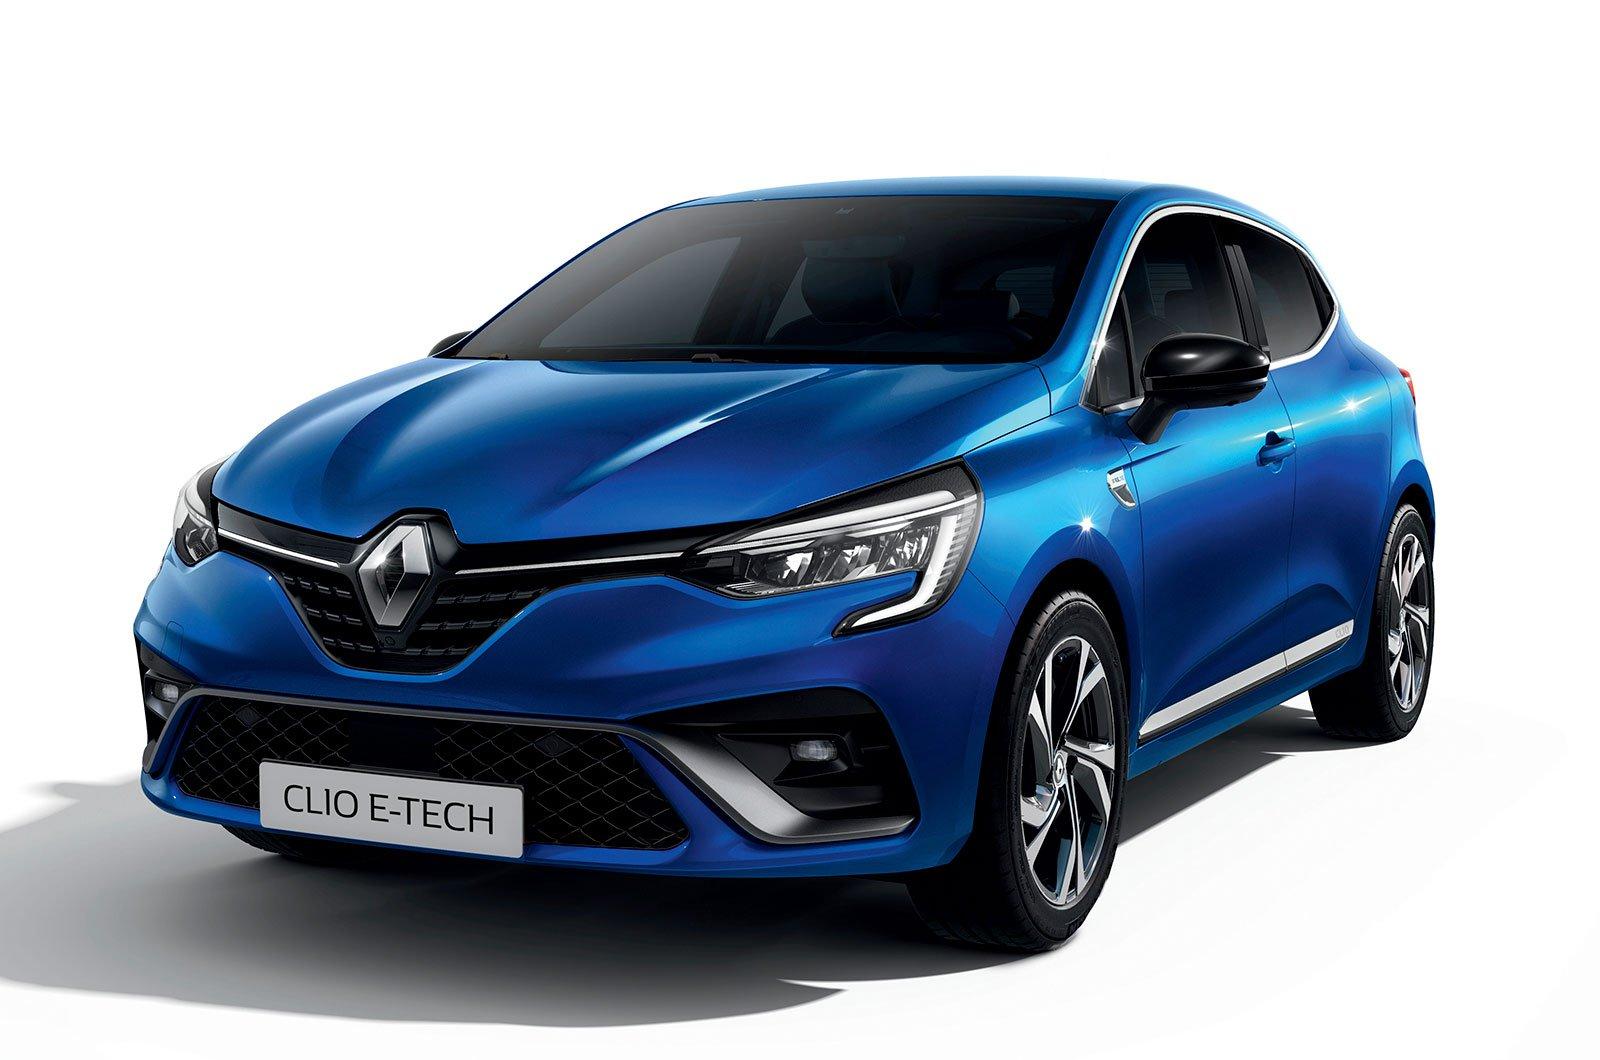 Renault Clio E-tech front